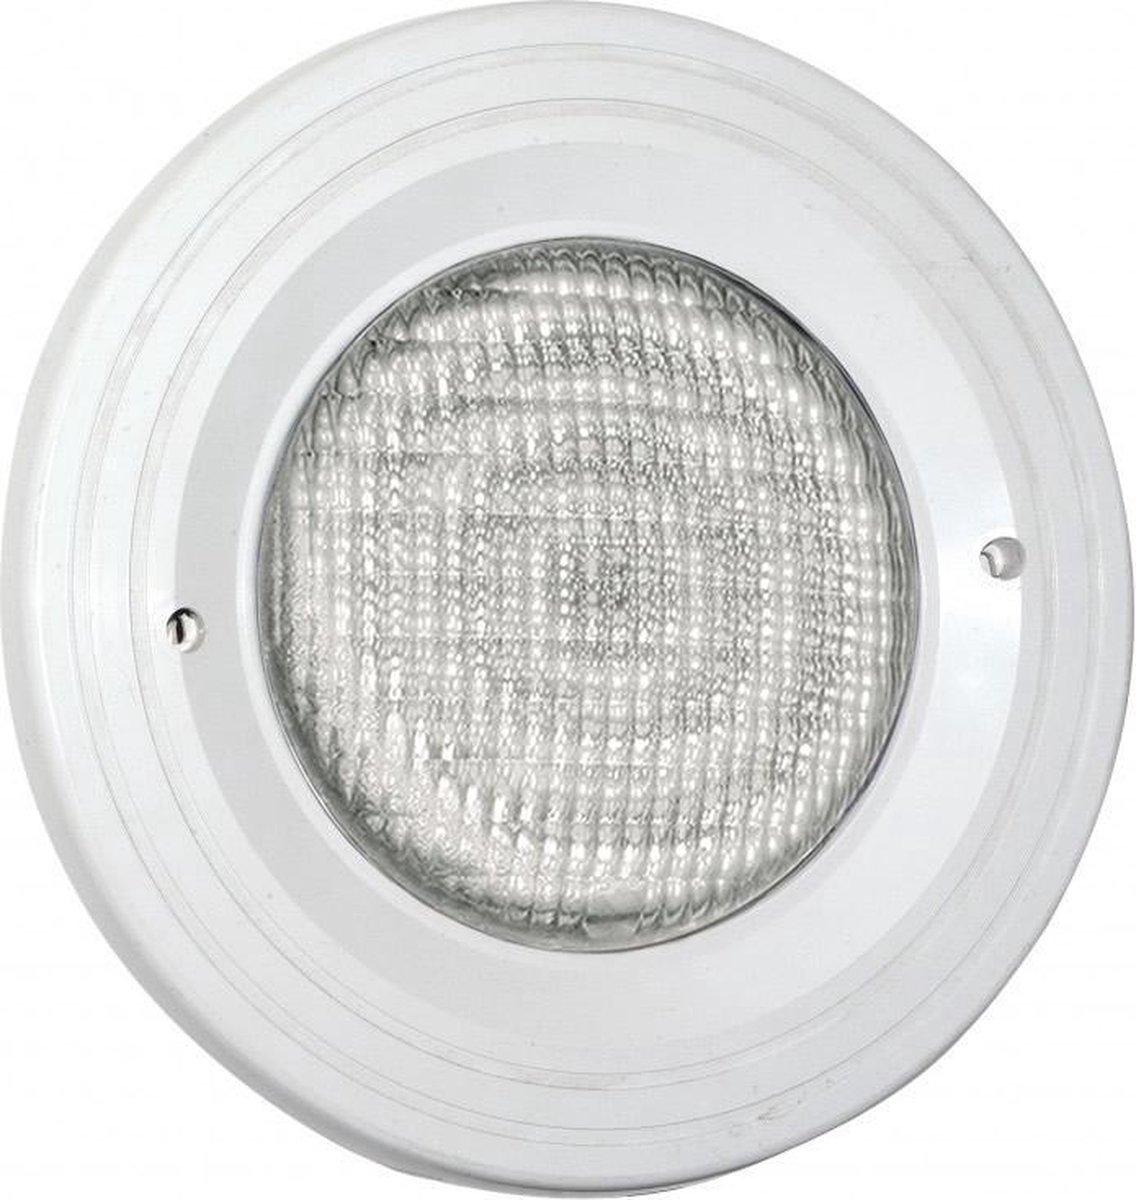 Zwembadlamp LED (wit) + inbouwset Aquareva wit